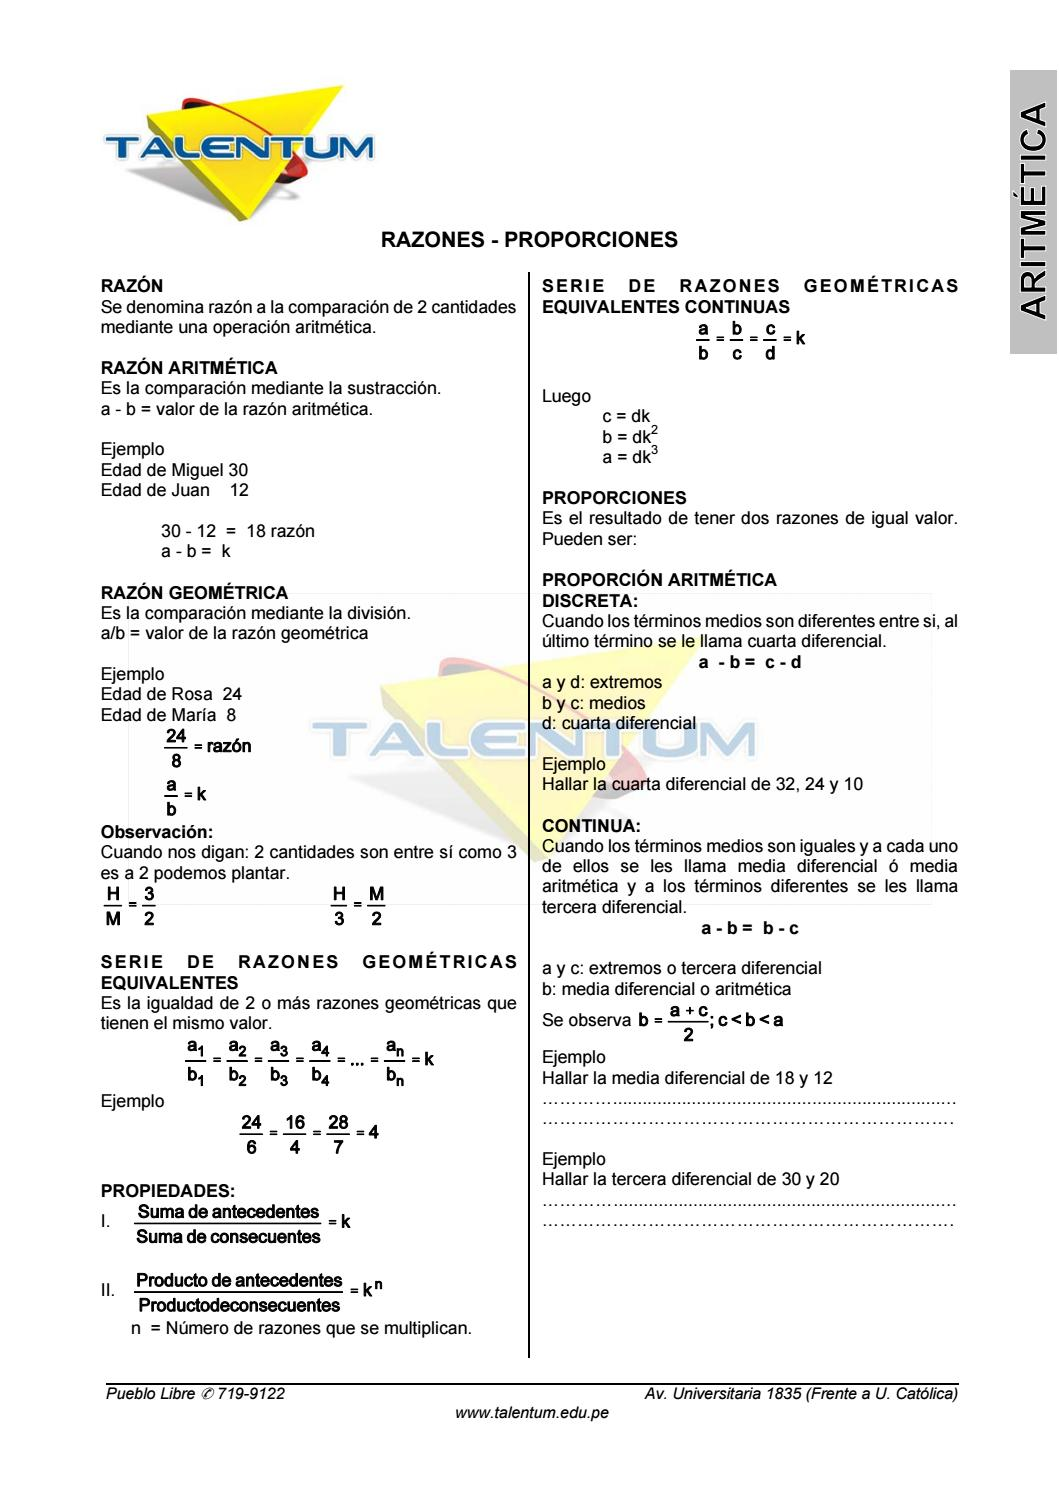 Platos para solteros-620344